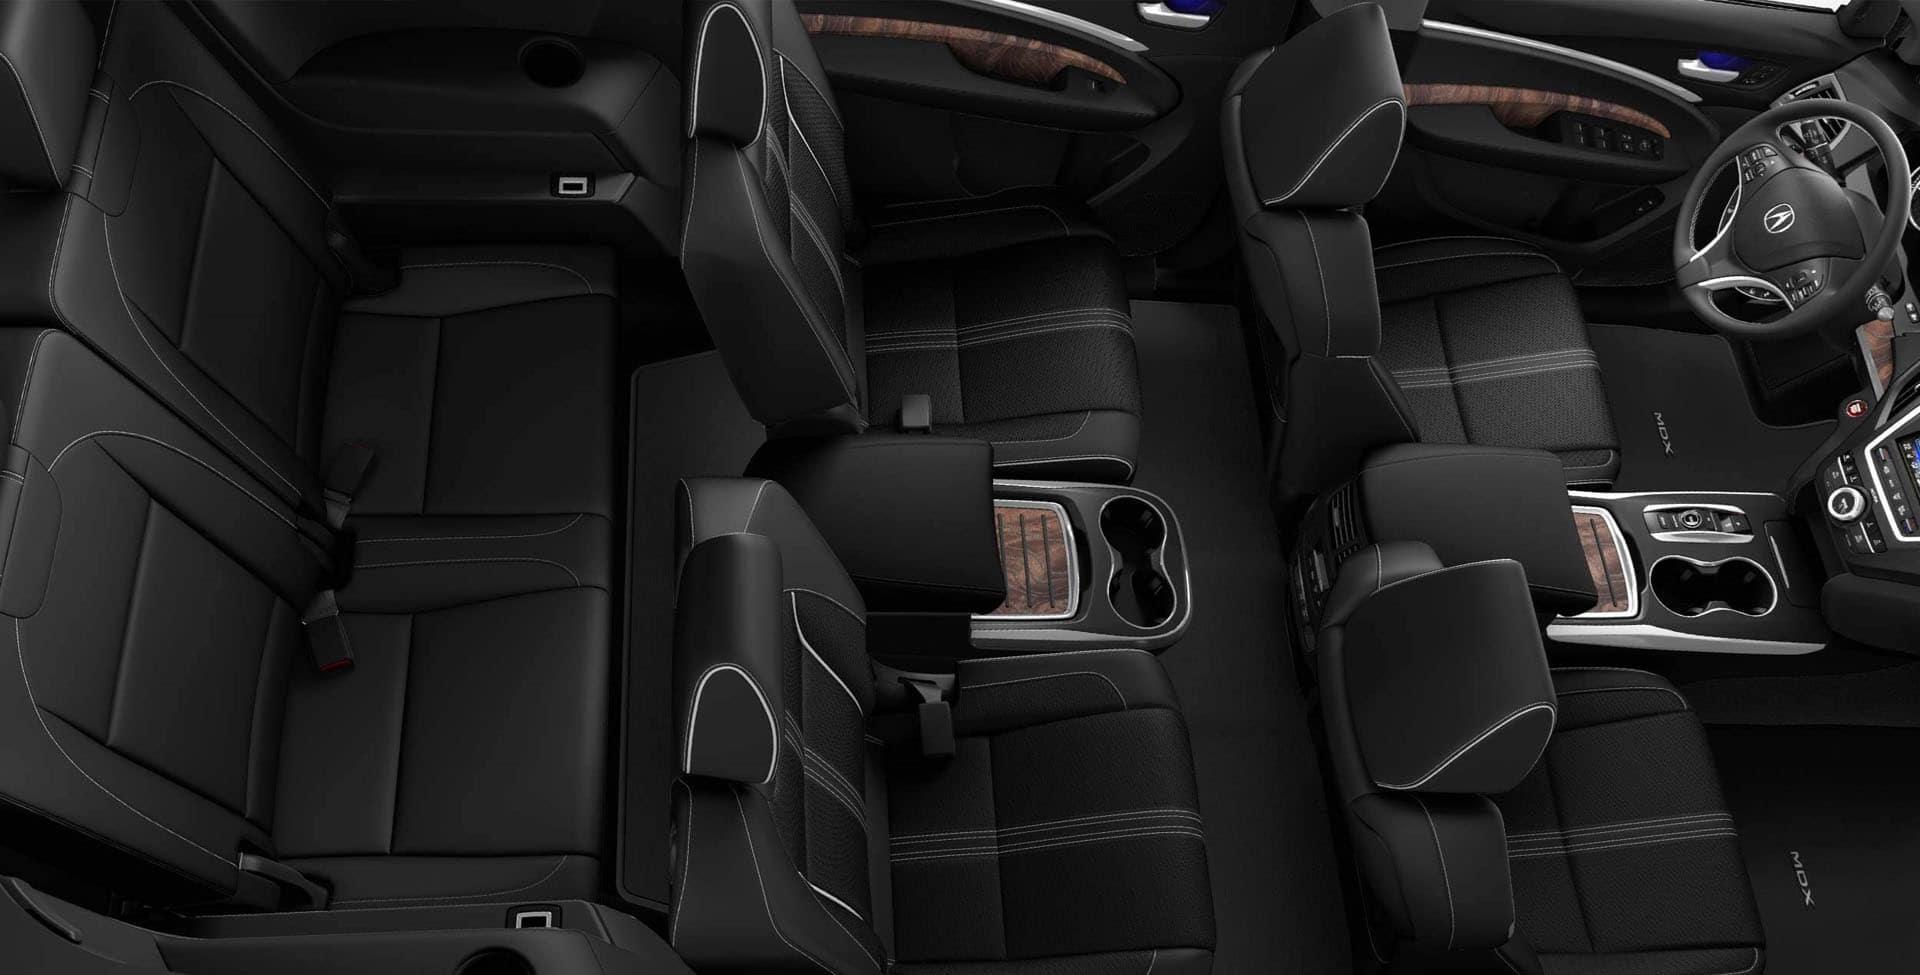 Acura MDX third row